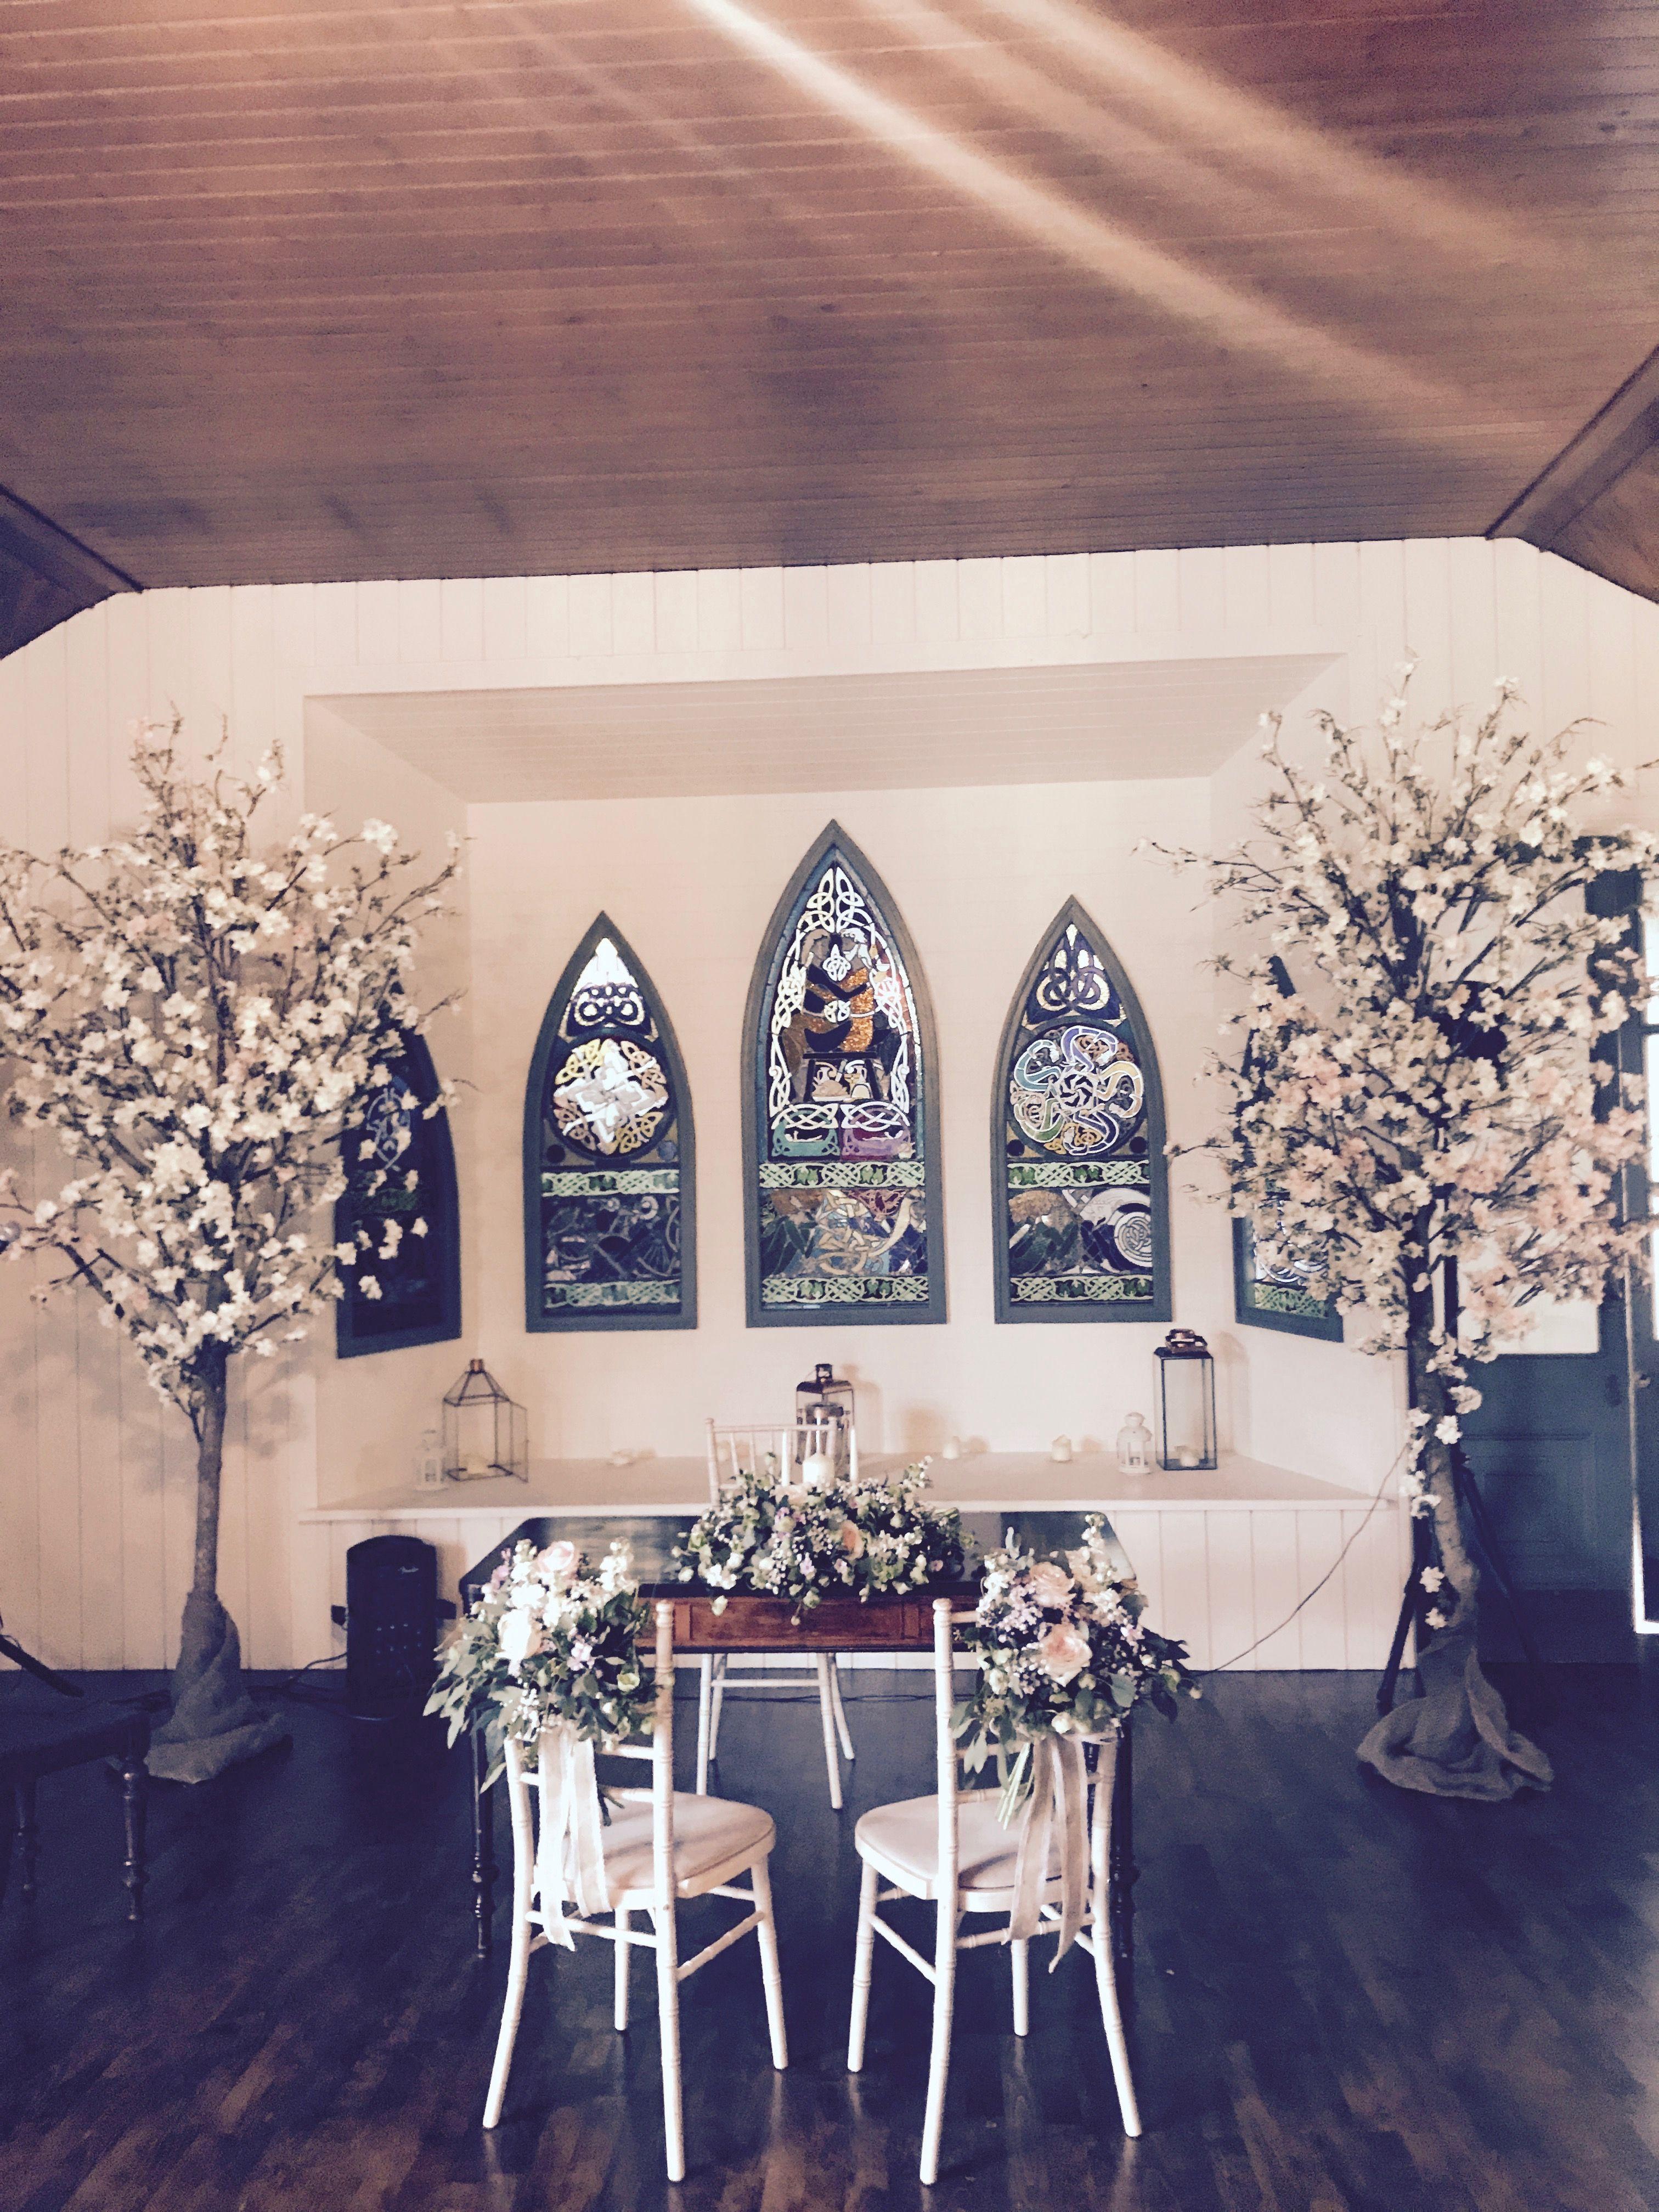 Wedding Ceremony Room Cherry Blossoms Bride Groom Chair Decor